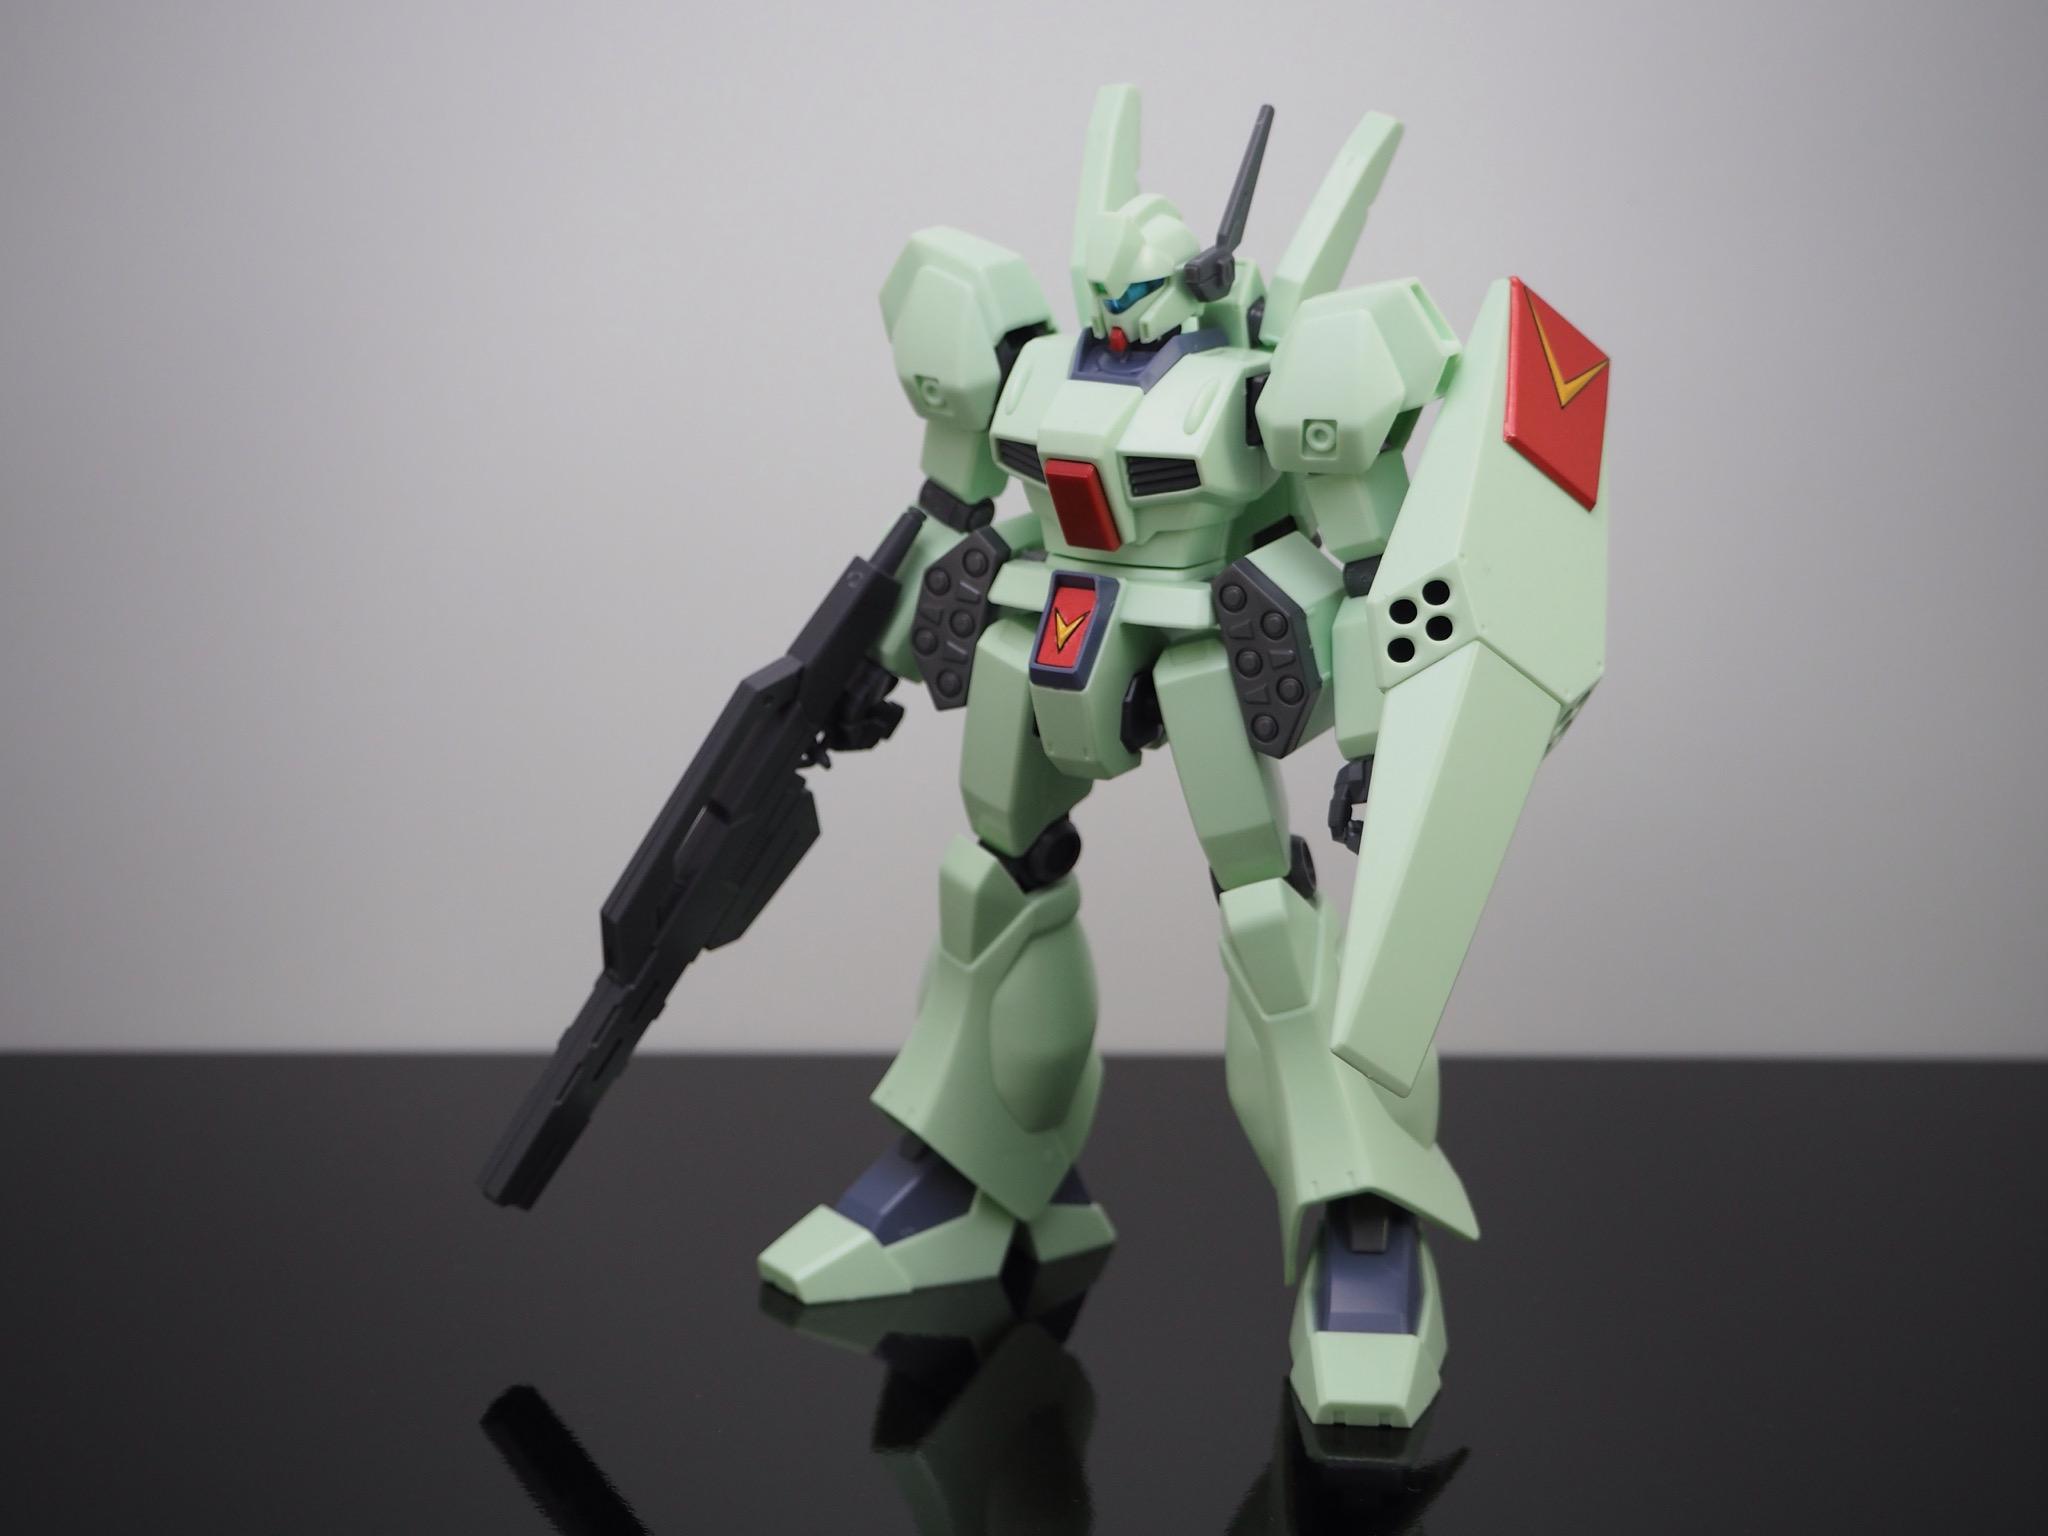 HGUC 1/144 RGM-89M ジェガン Bタイプ(F91Ver.) [Jegan B-Type (F91 Ver.)]